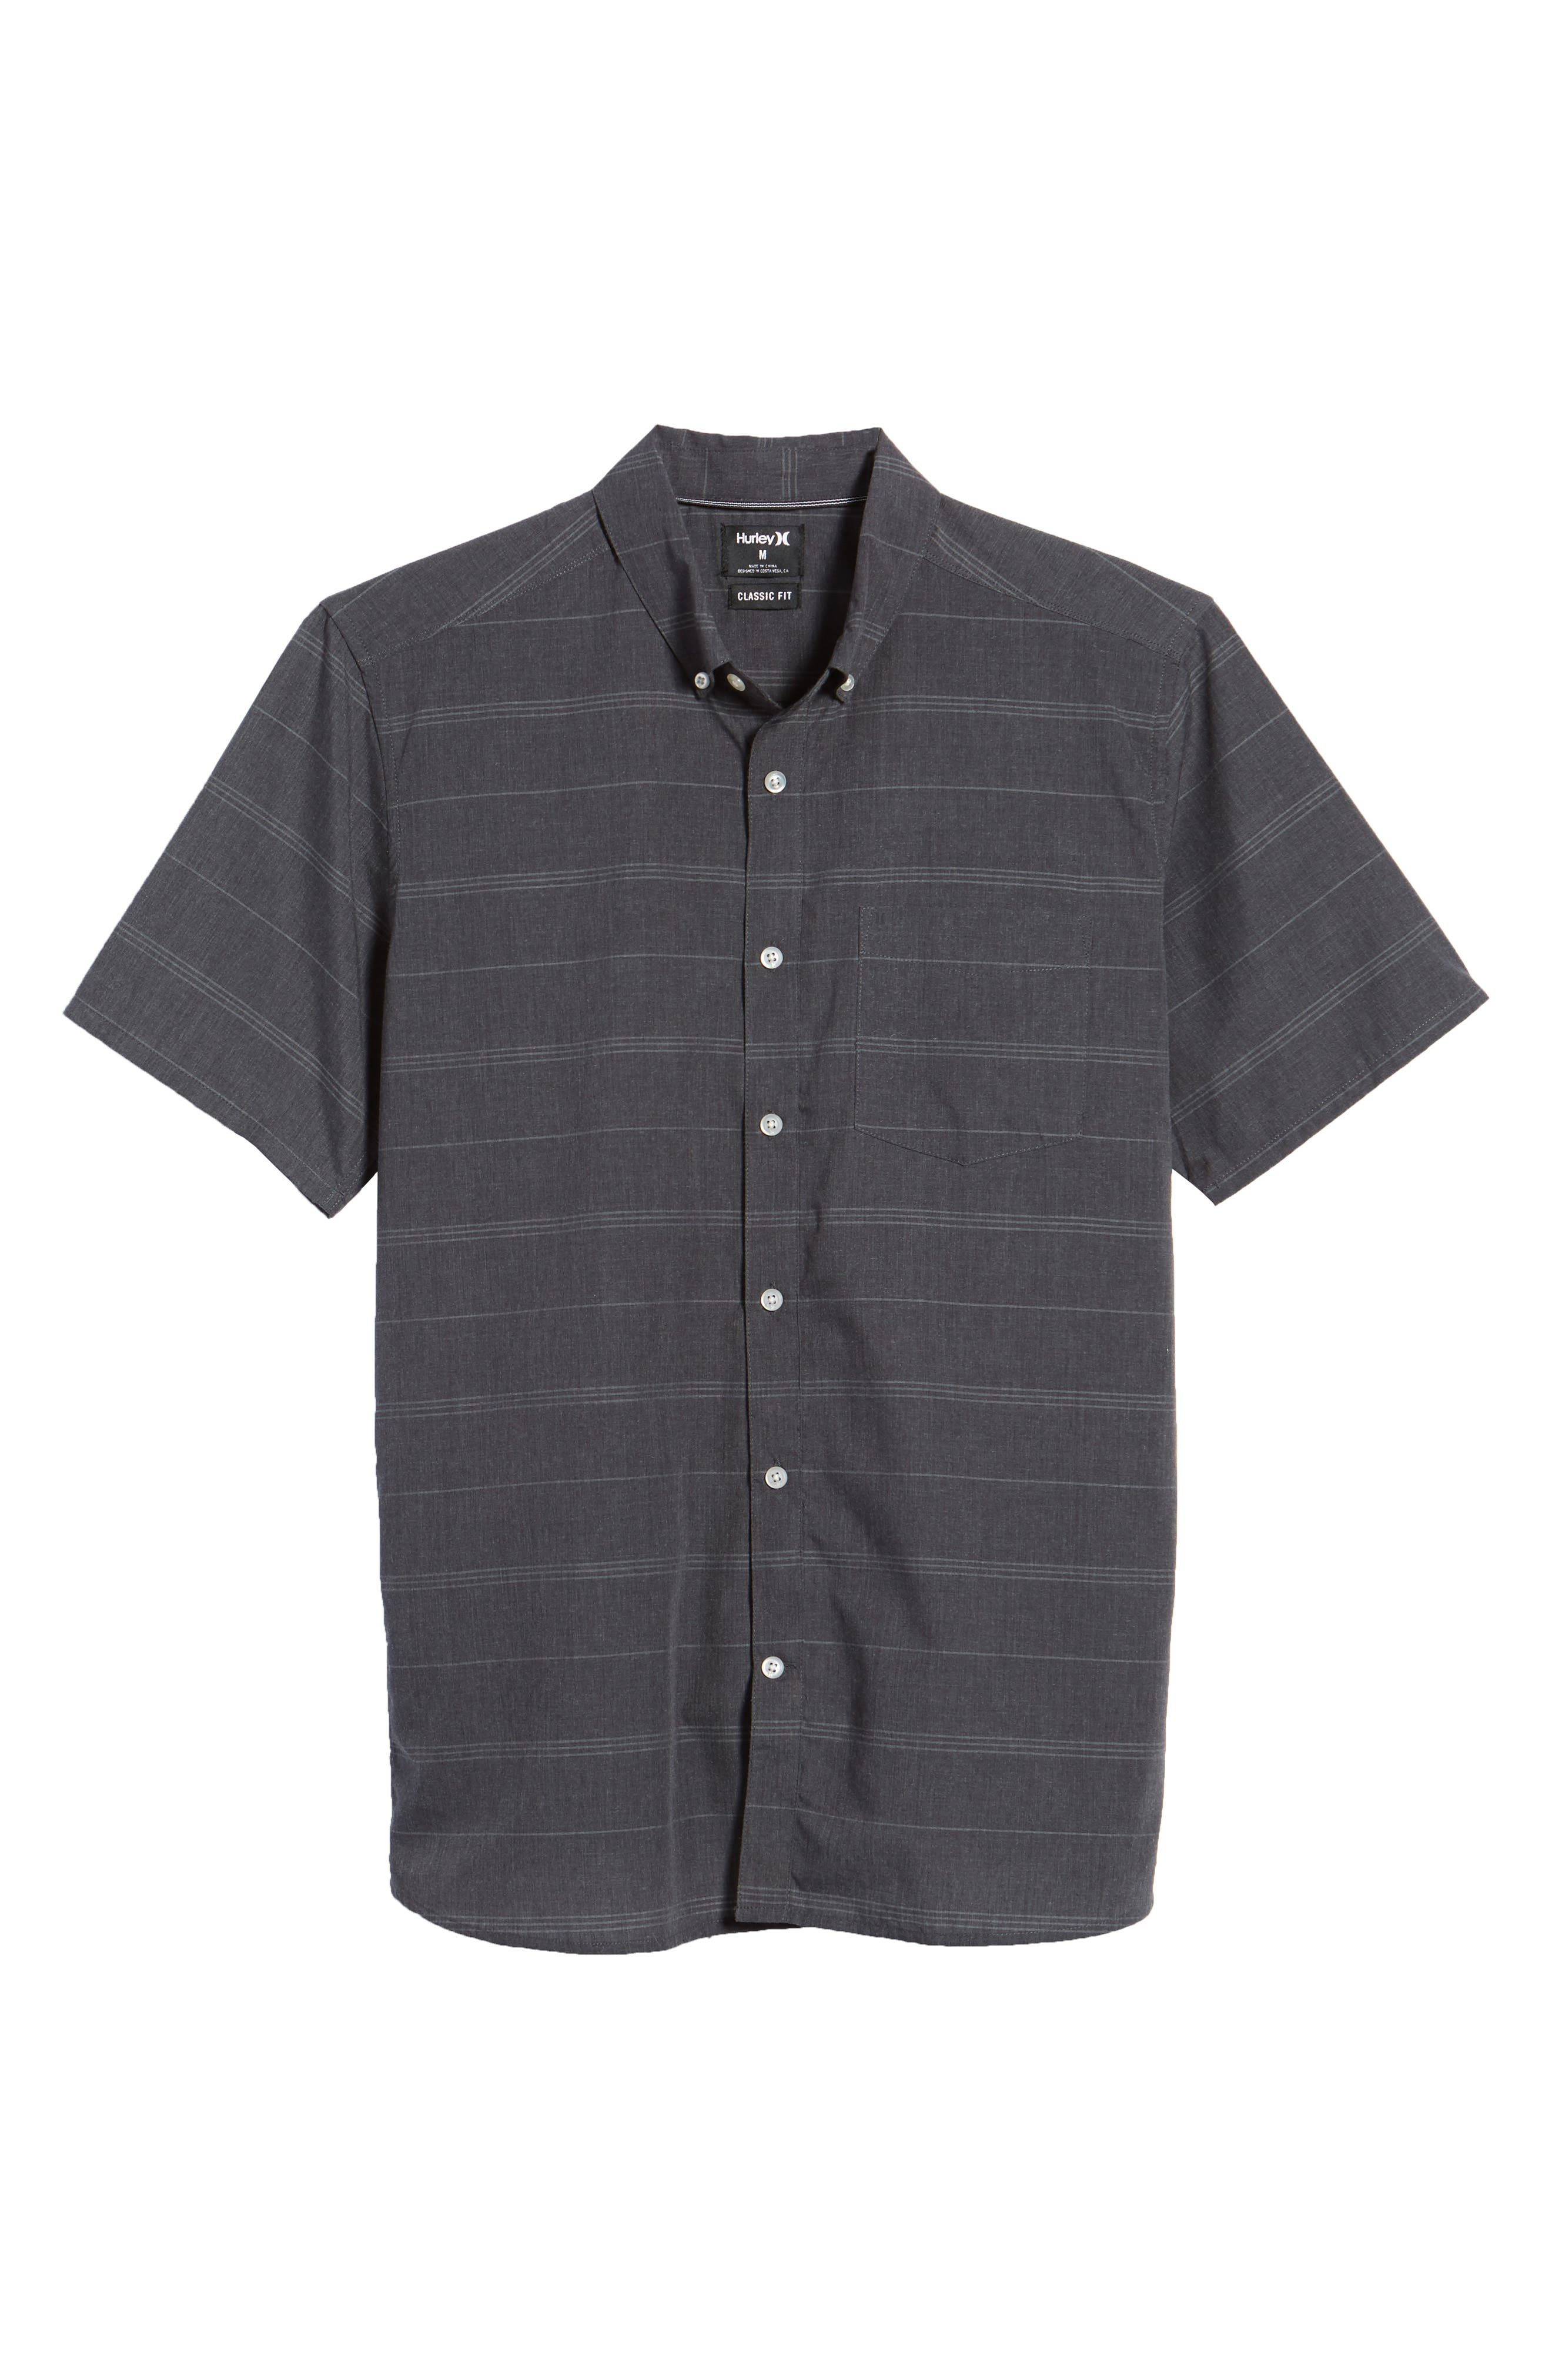 HURLEY,                             Dri-FIT Rhythm Shirt,                             Alternate thumbnail 6, color,                             010